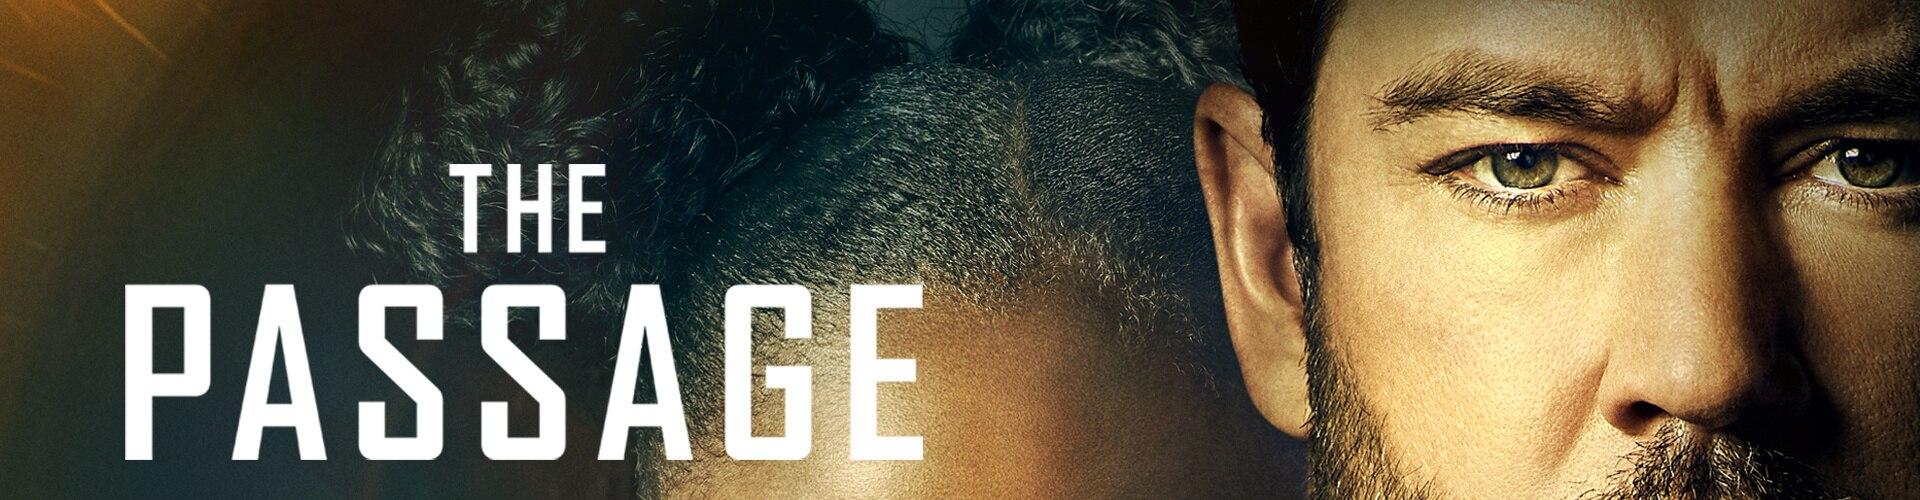 Watch The Passage Online